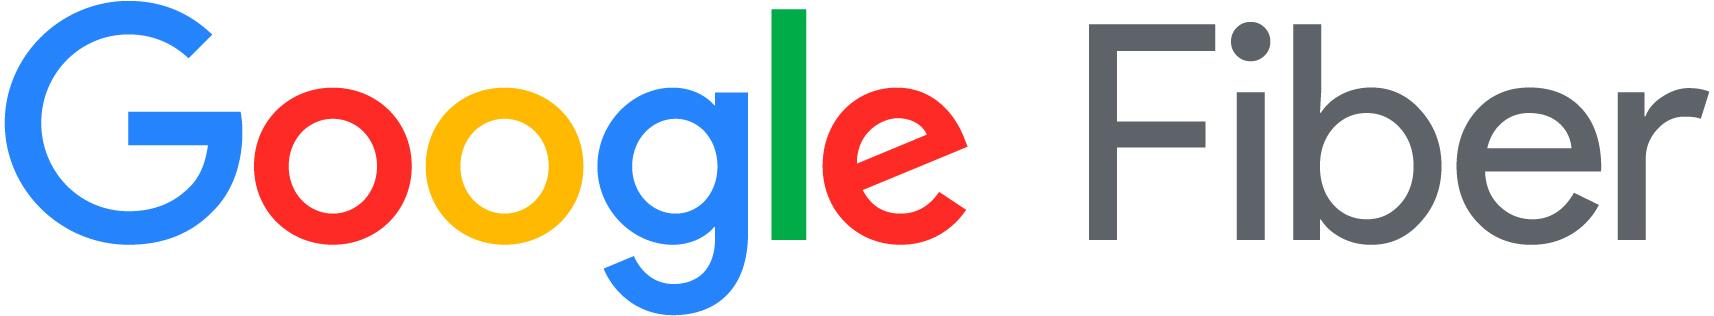 GoogleFiber_logo-color.jpg